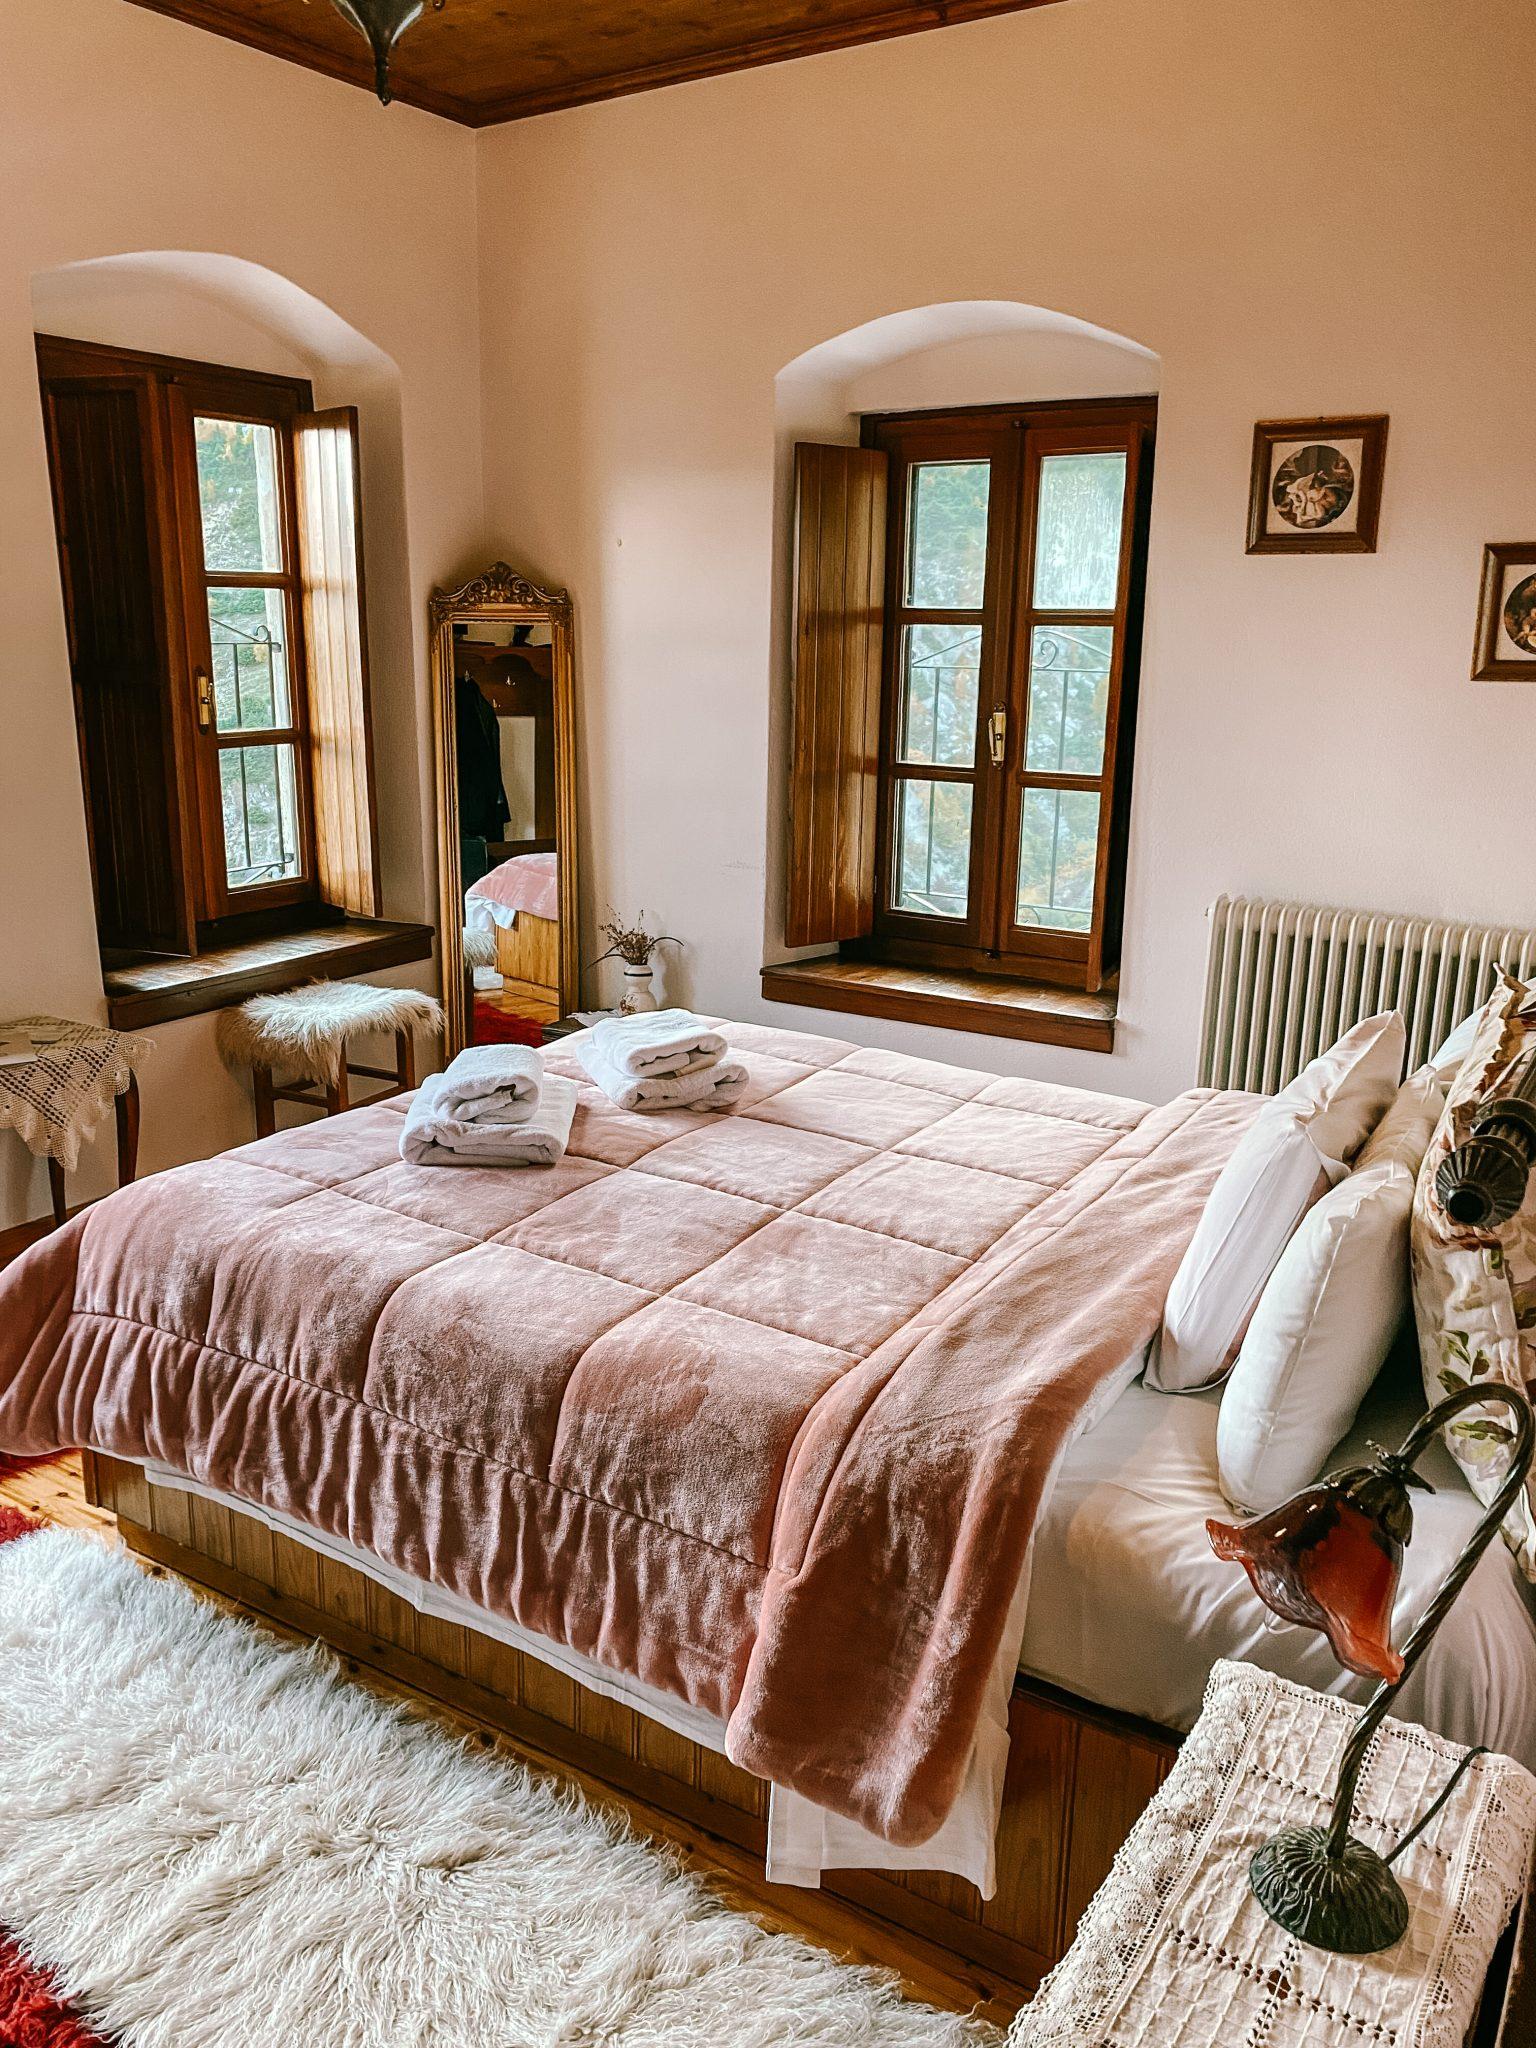 Hotels in Tzoumerka